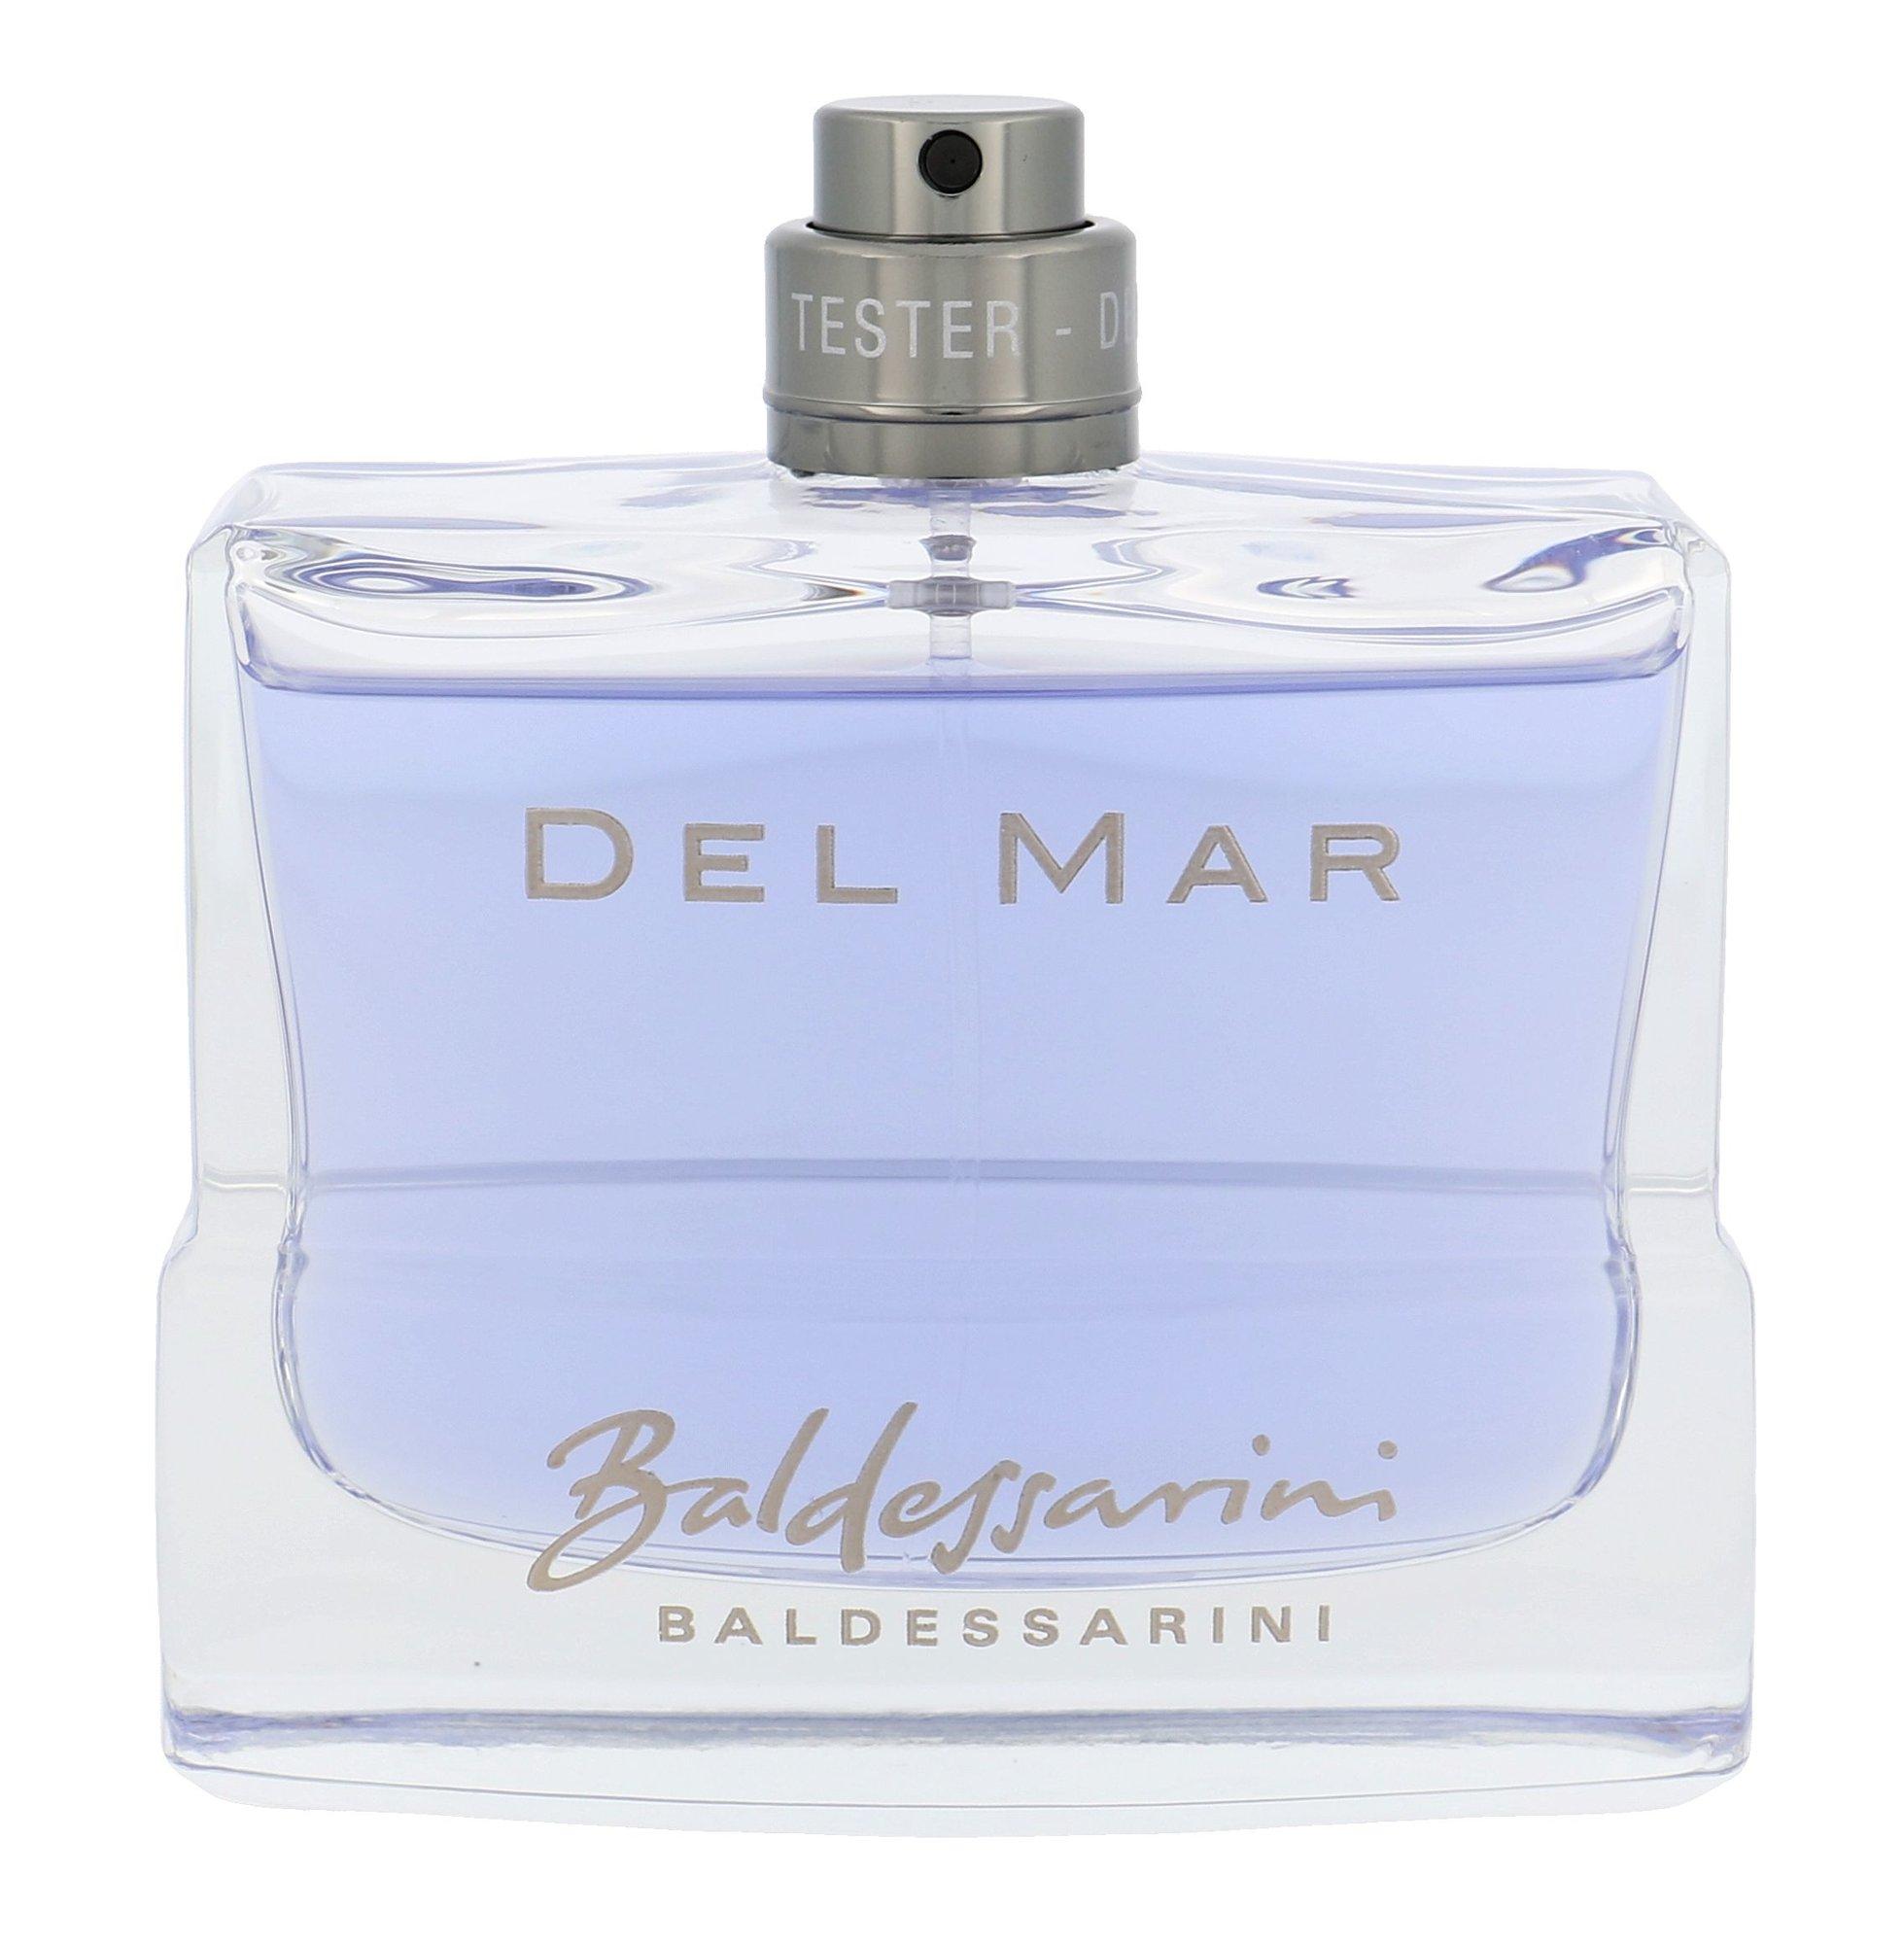 Baldessarini Del Mar, Toaletní voda 90ml, Tester